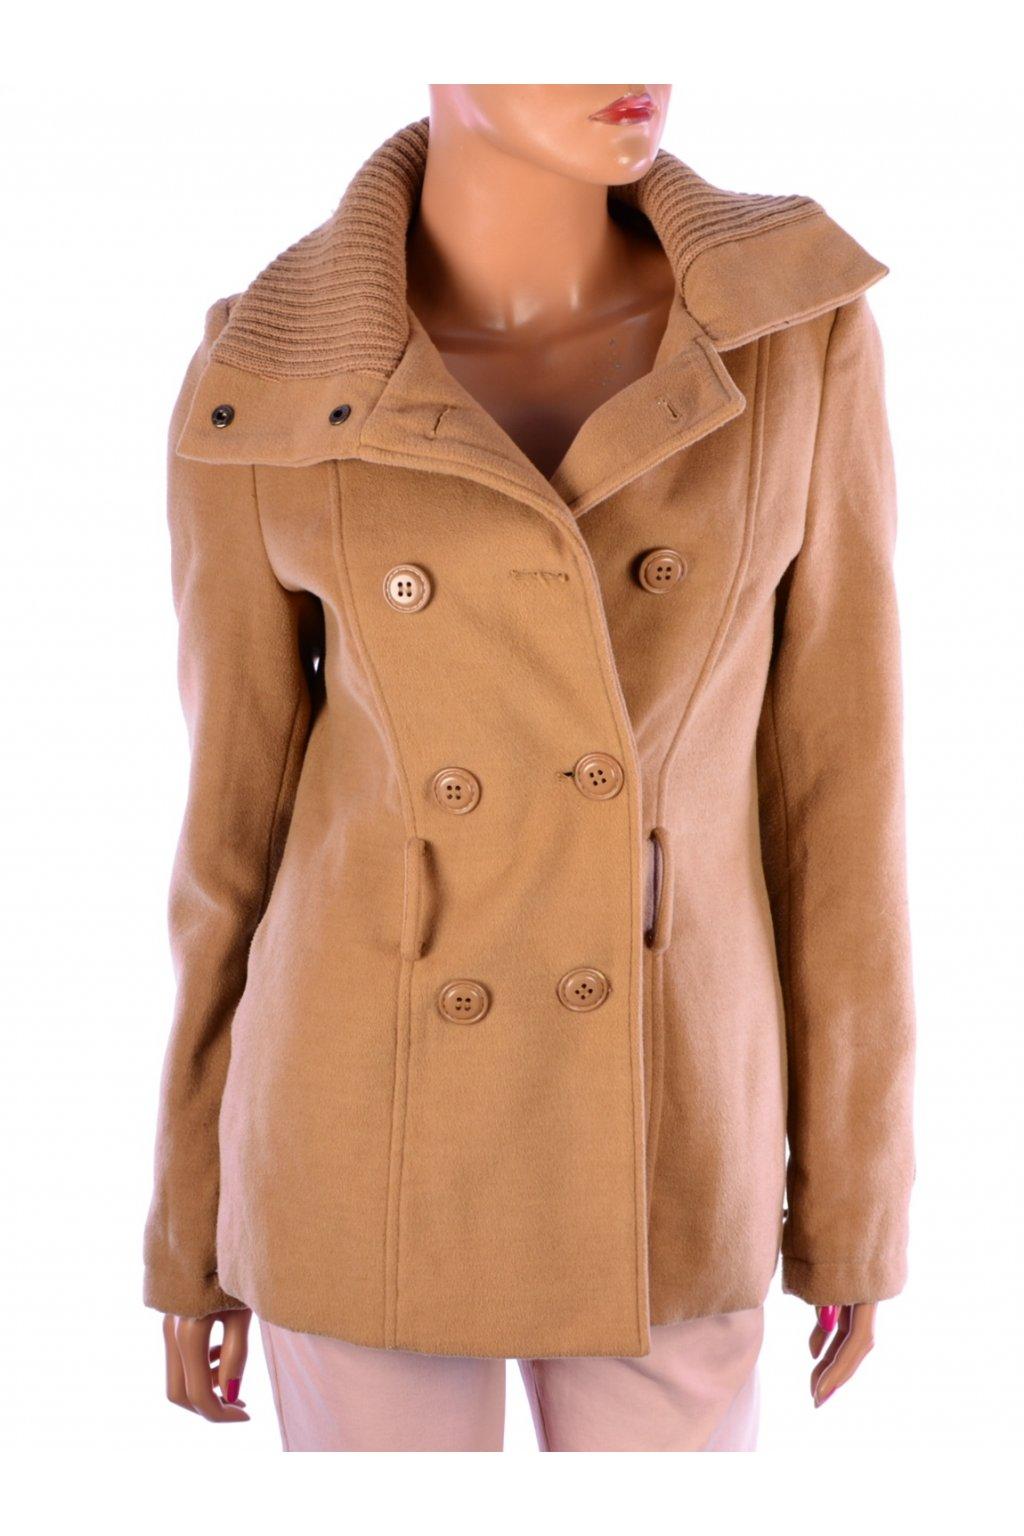 Bunda kabát béžová podzim zima Amisu vel. 36 / S